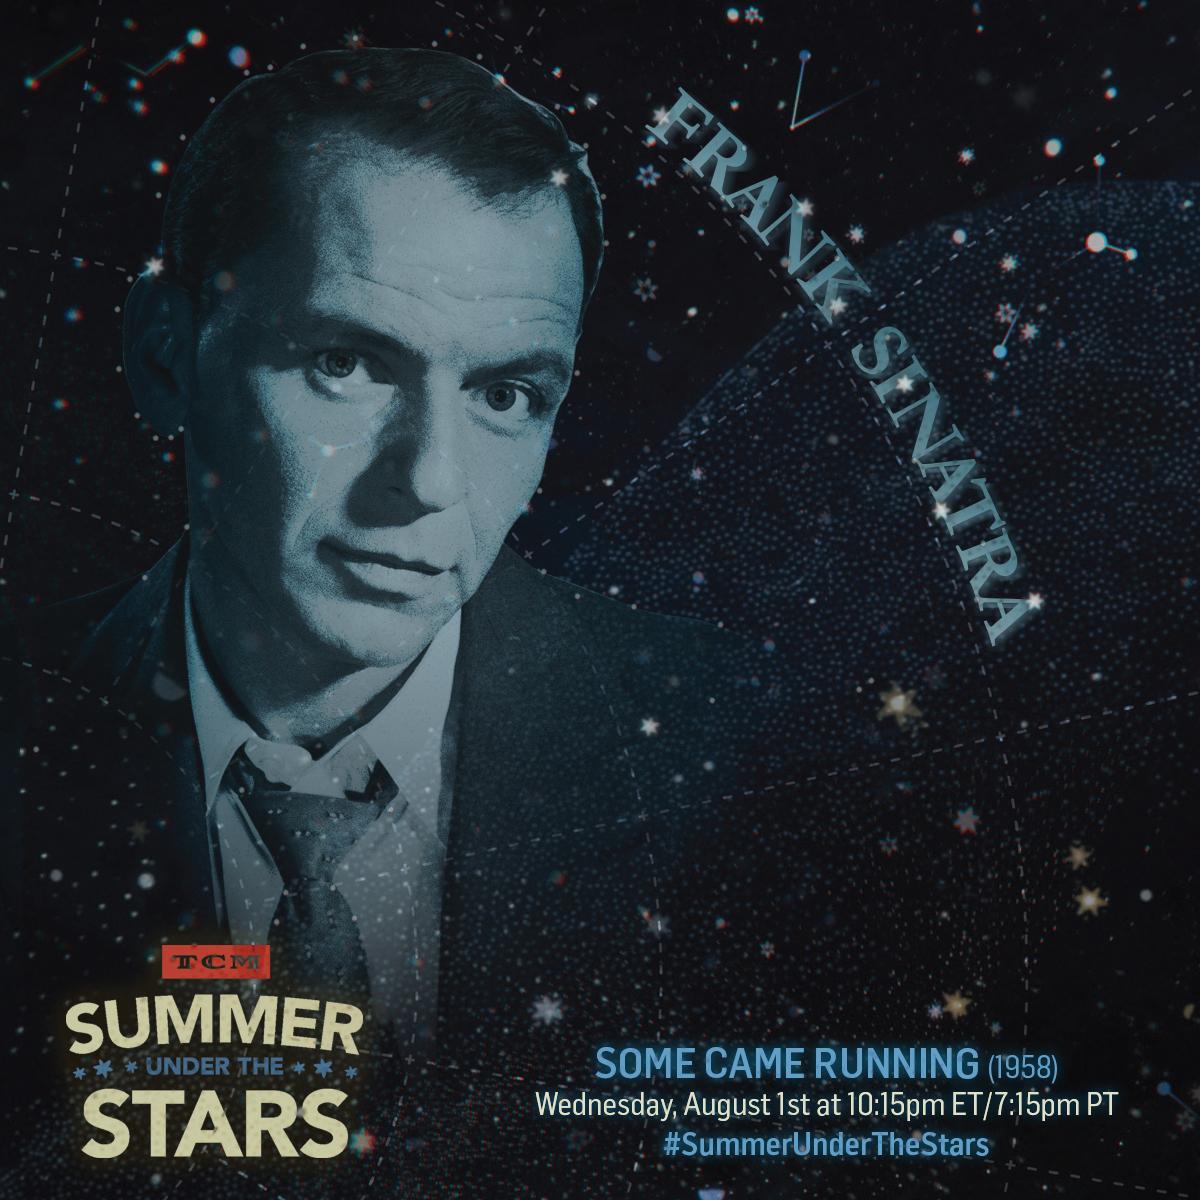 TCM_DailyAssets_18-08_SUTS_Day1-Sinatra.jpg